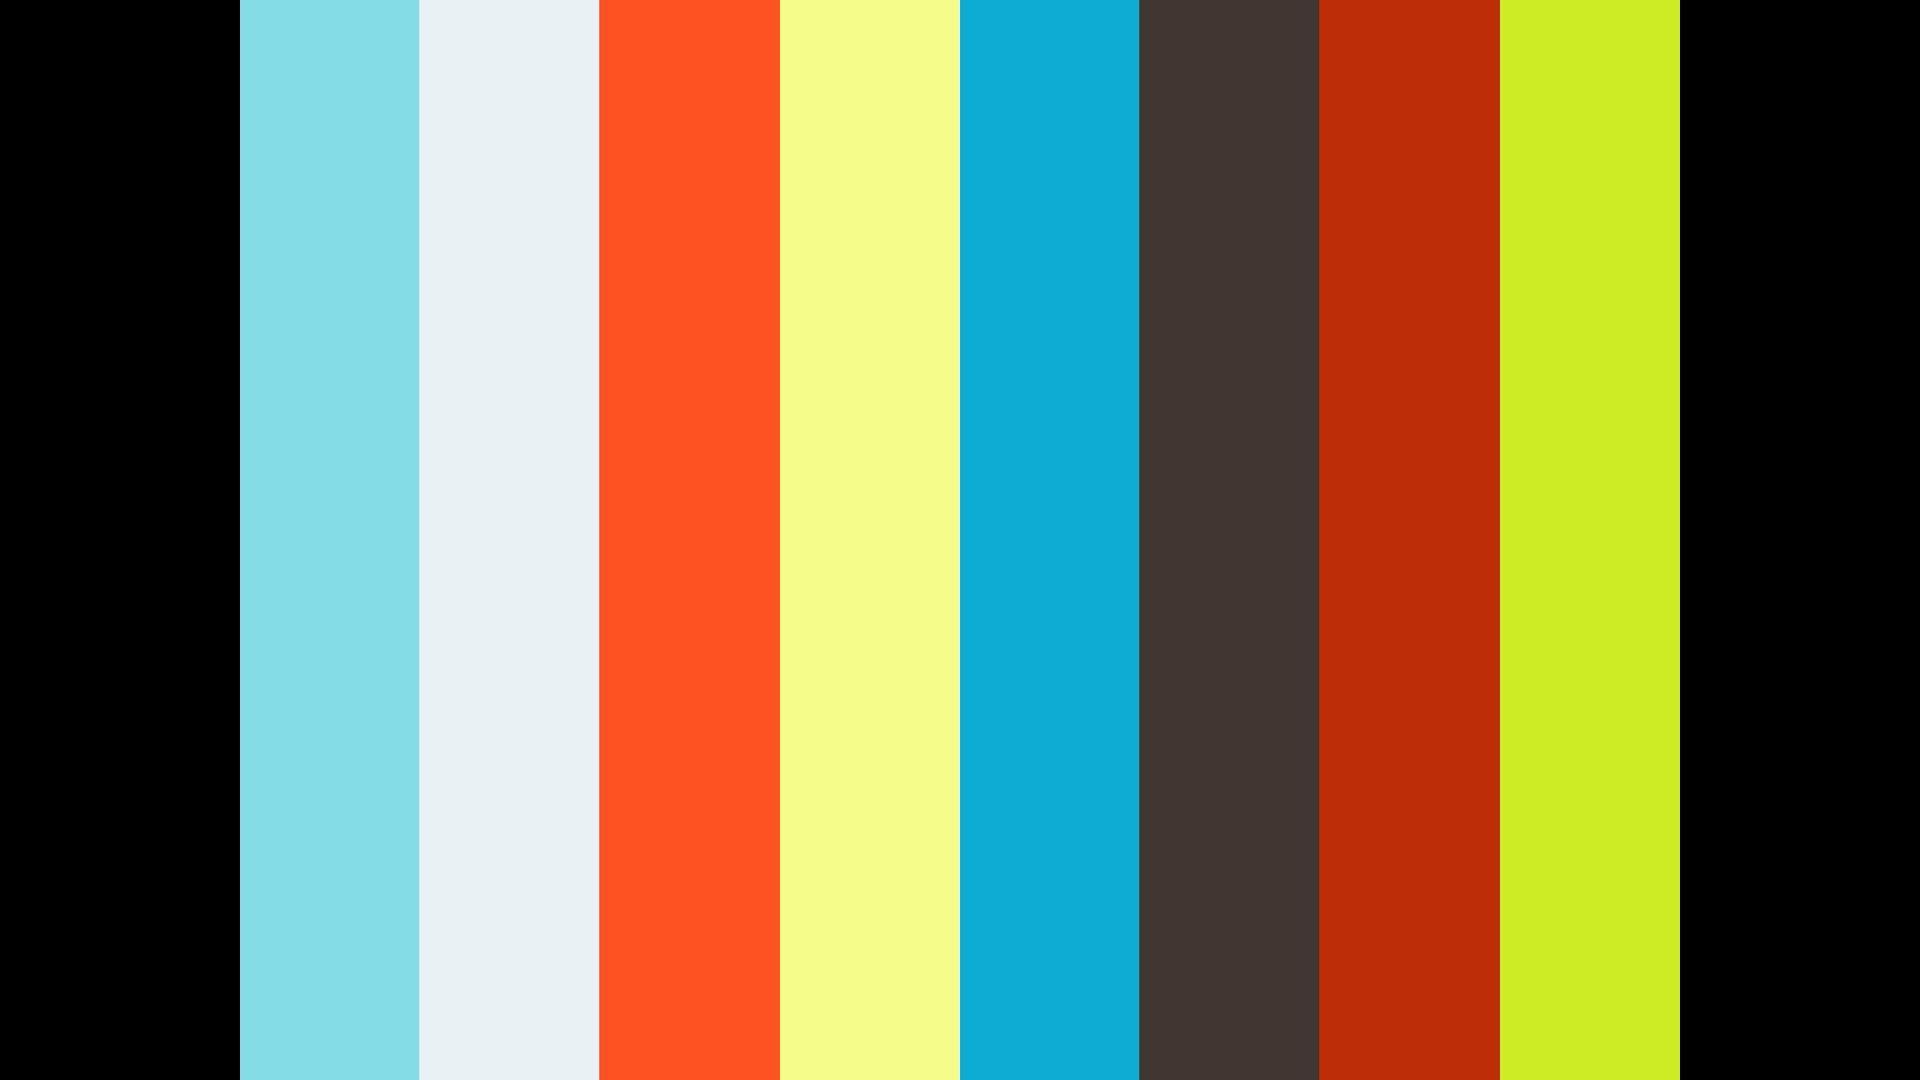 Marco Palladino, Kong   KubeCon + CloudNativeCon San Diego 2019